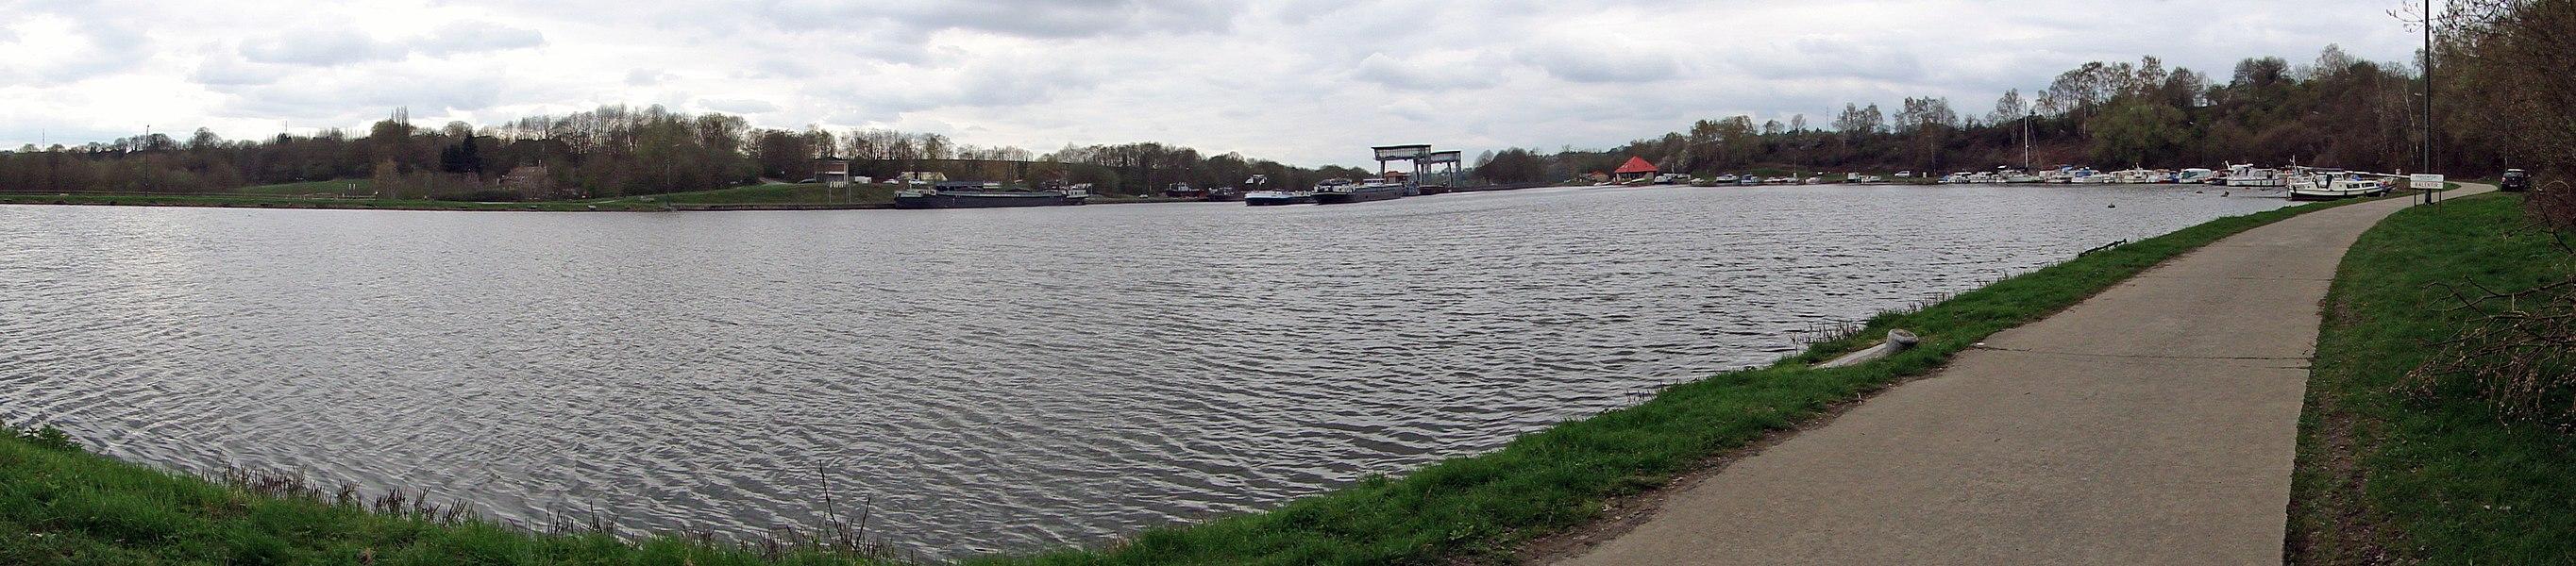 Canal Charleroi Bruxelles